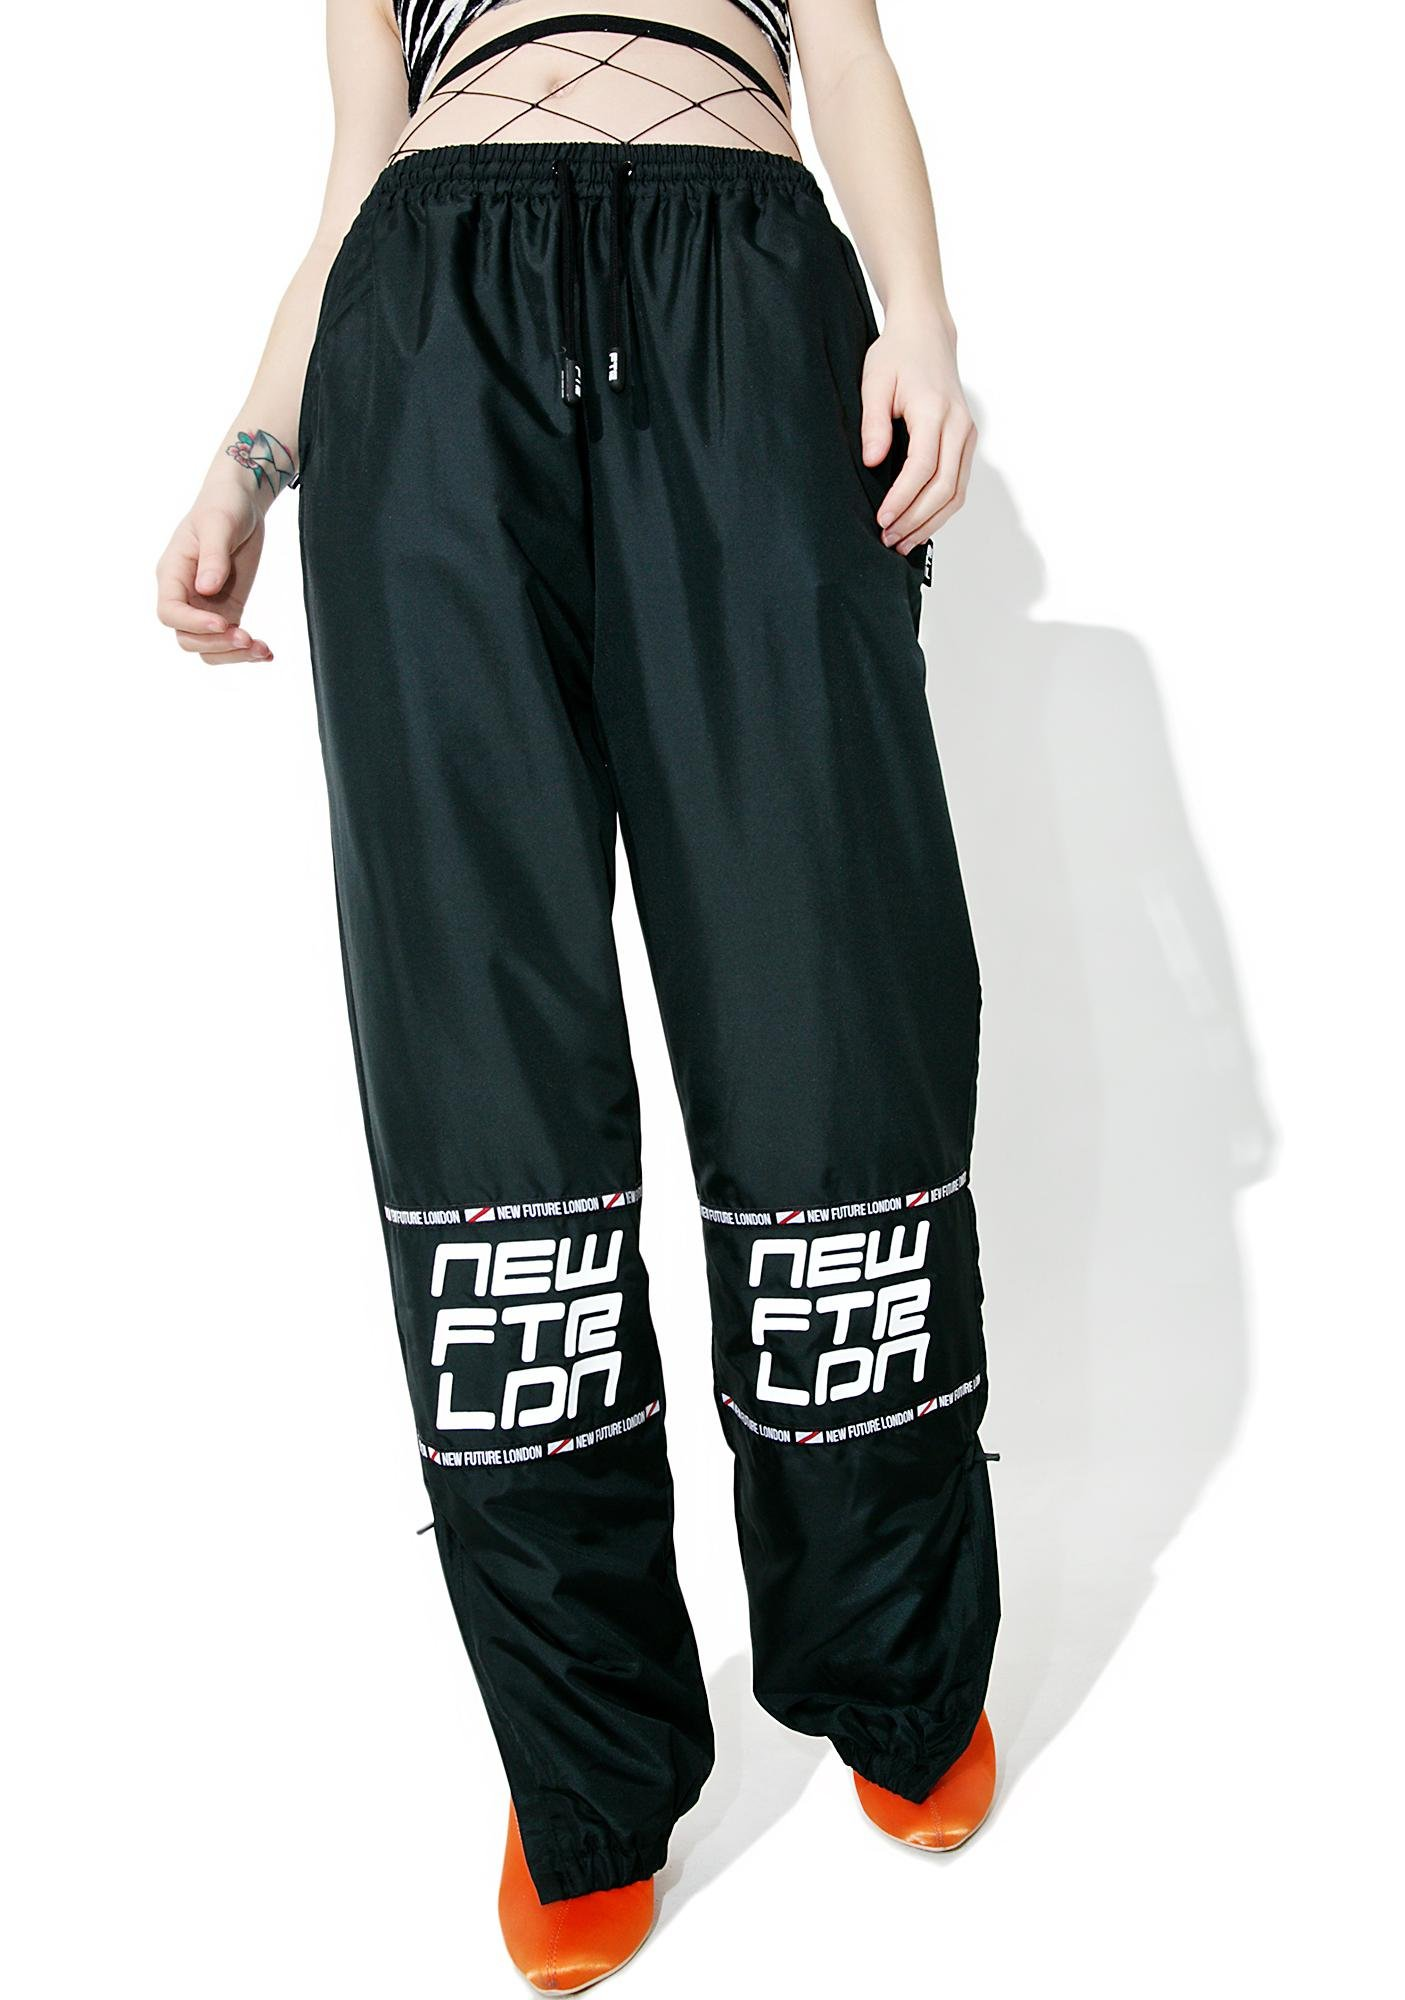 NEW FTR LDN Racer Logo Sweat Pants